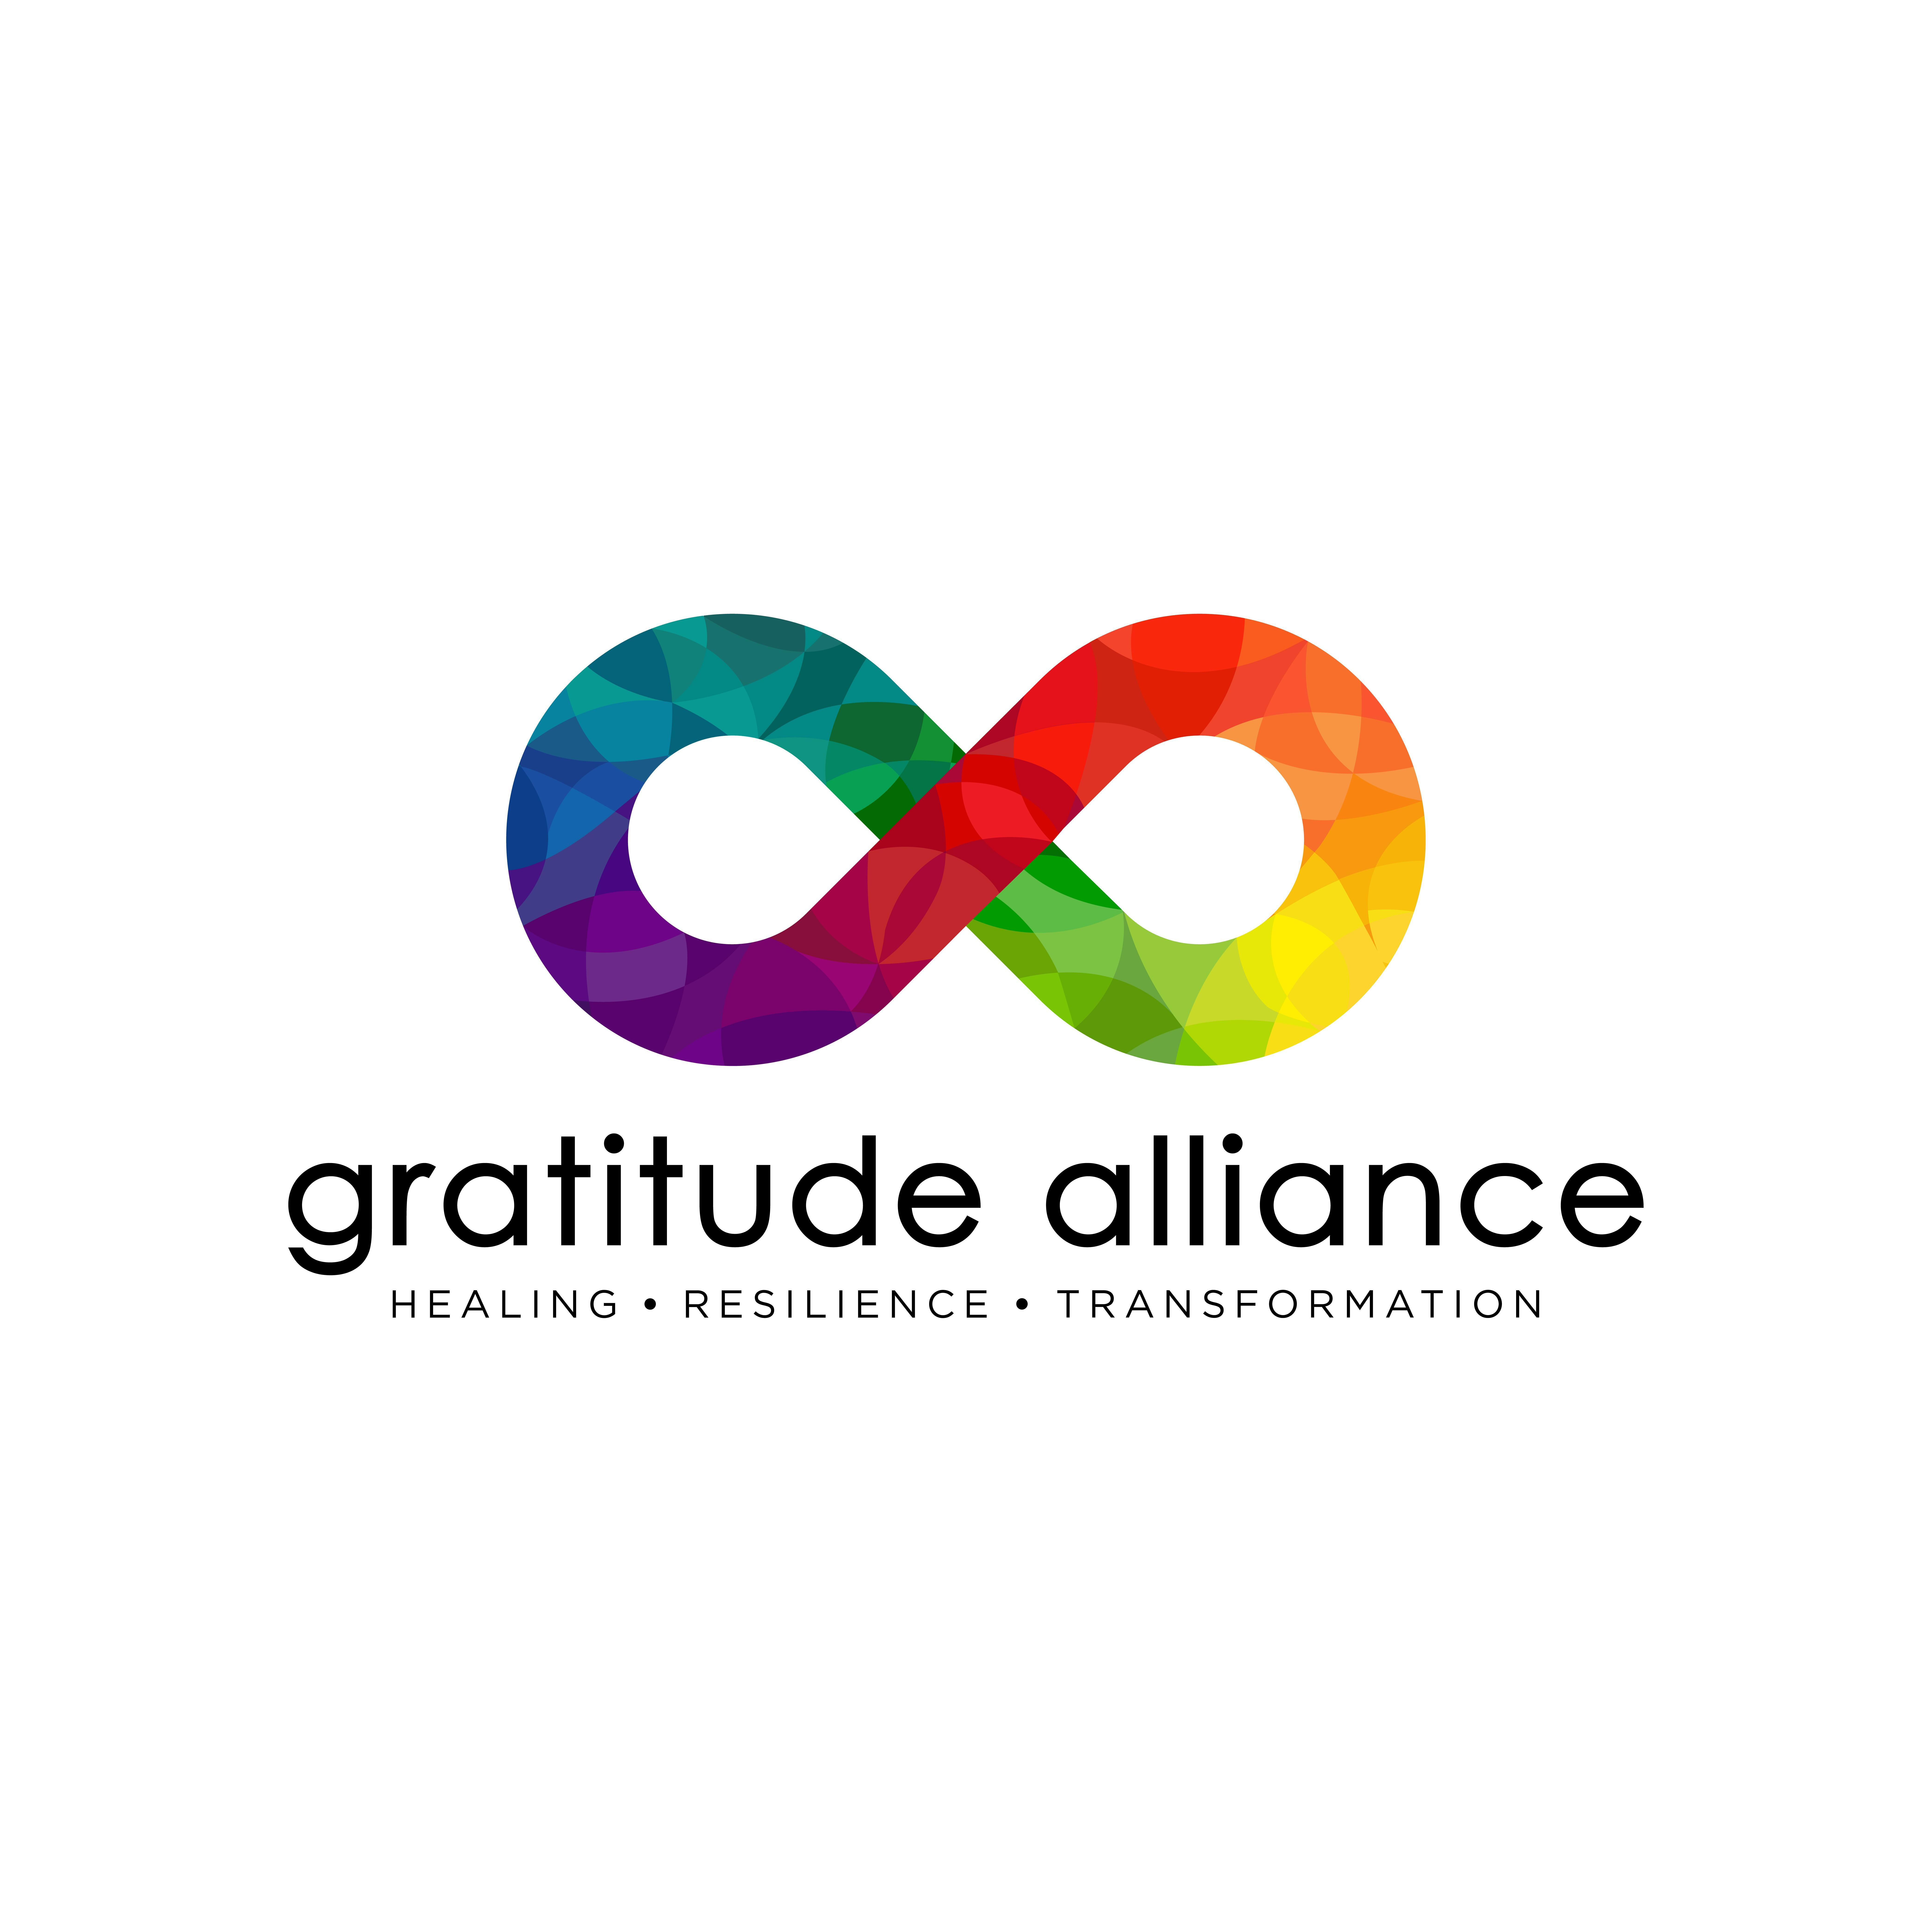 Create a bold, modern logo for a nonprofit that heals trauma around the world